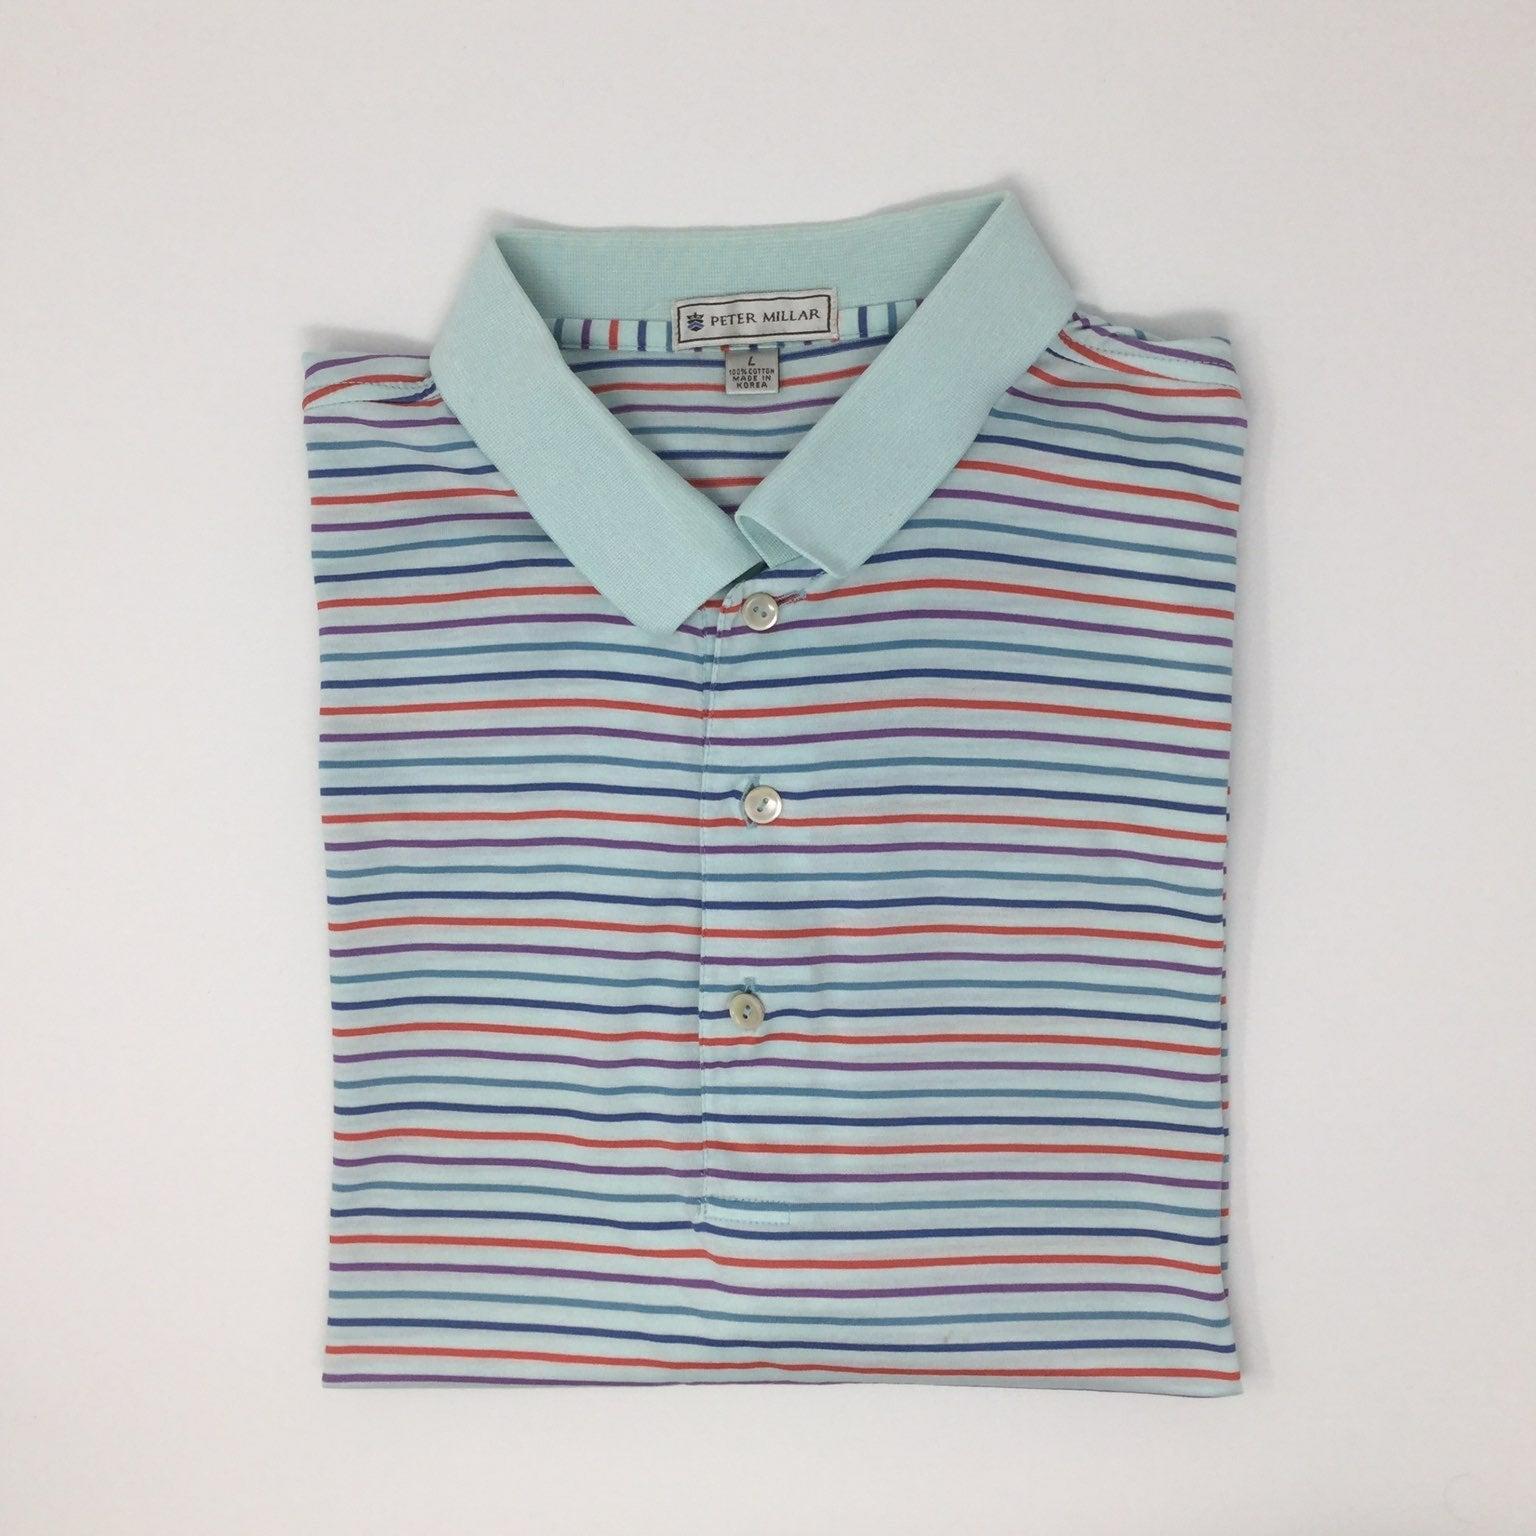 Peter Millar Striped Polo Shirt Size L